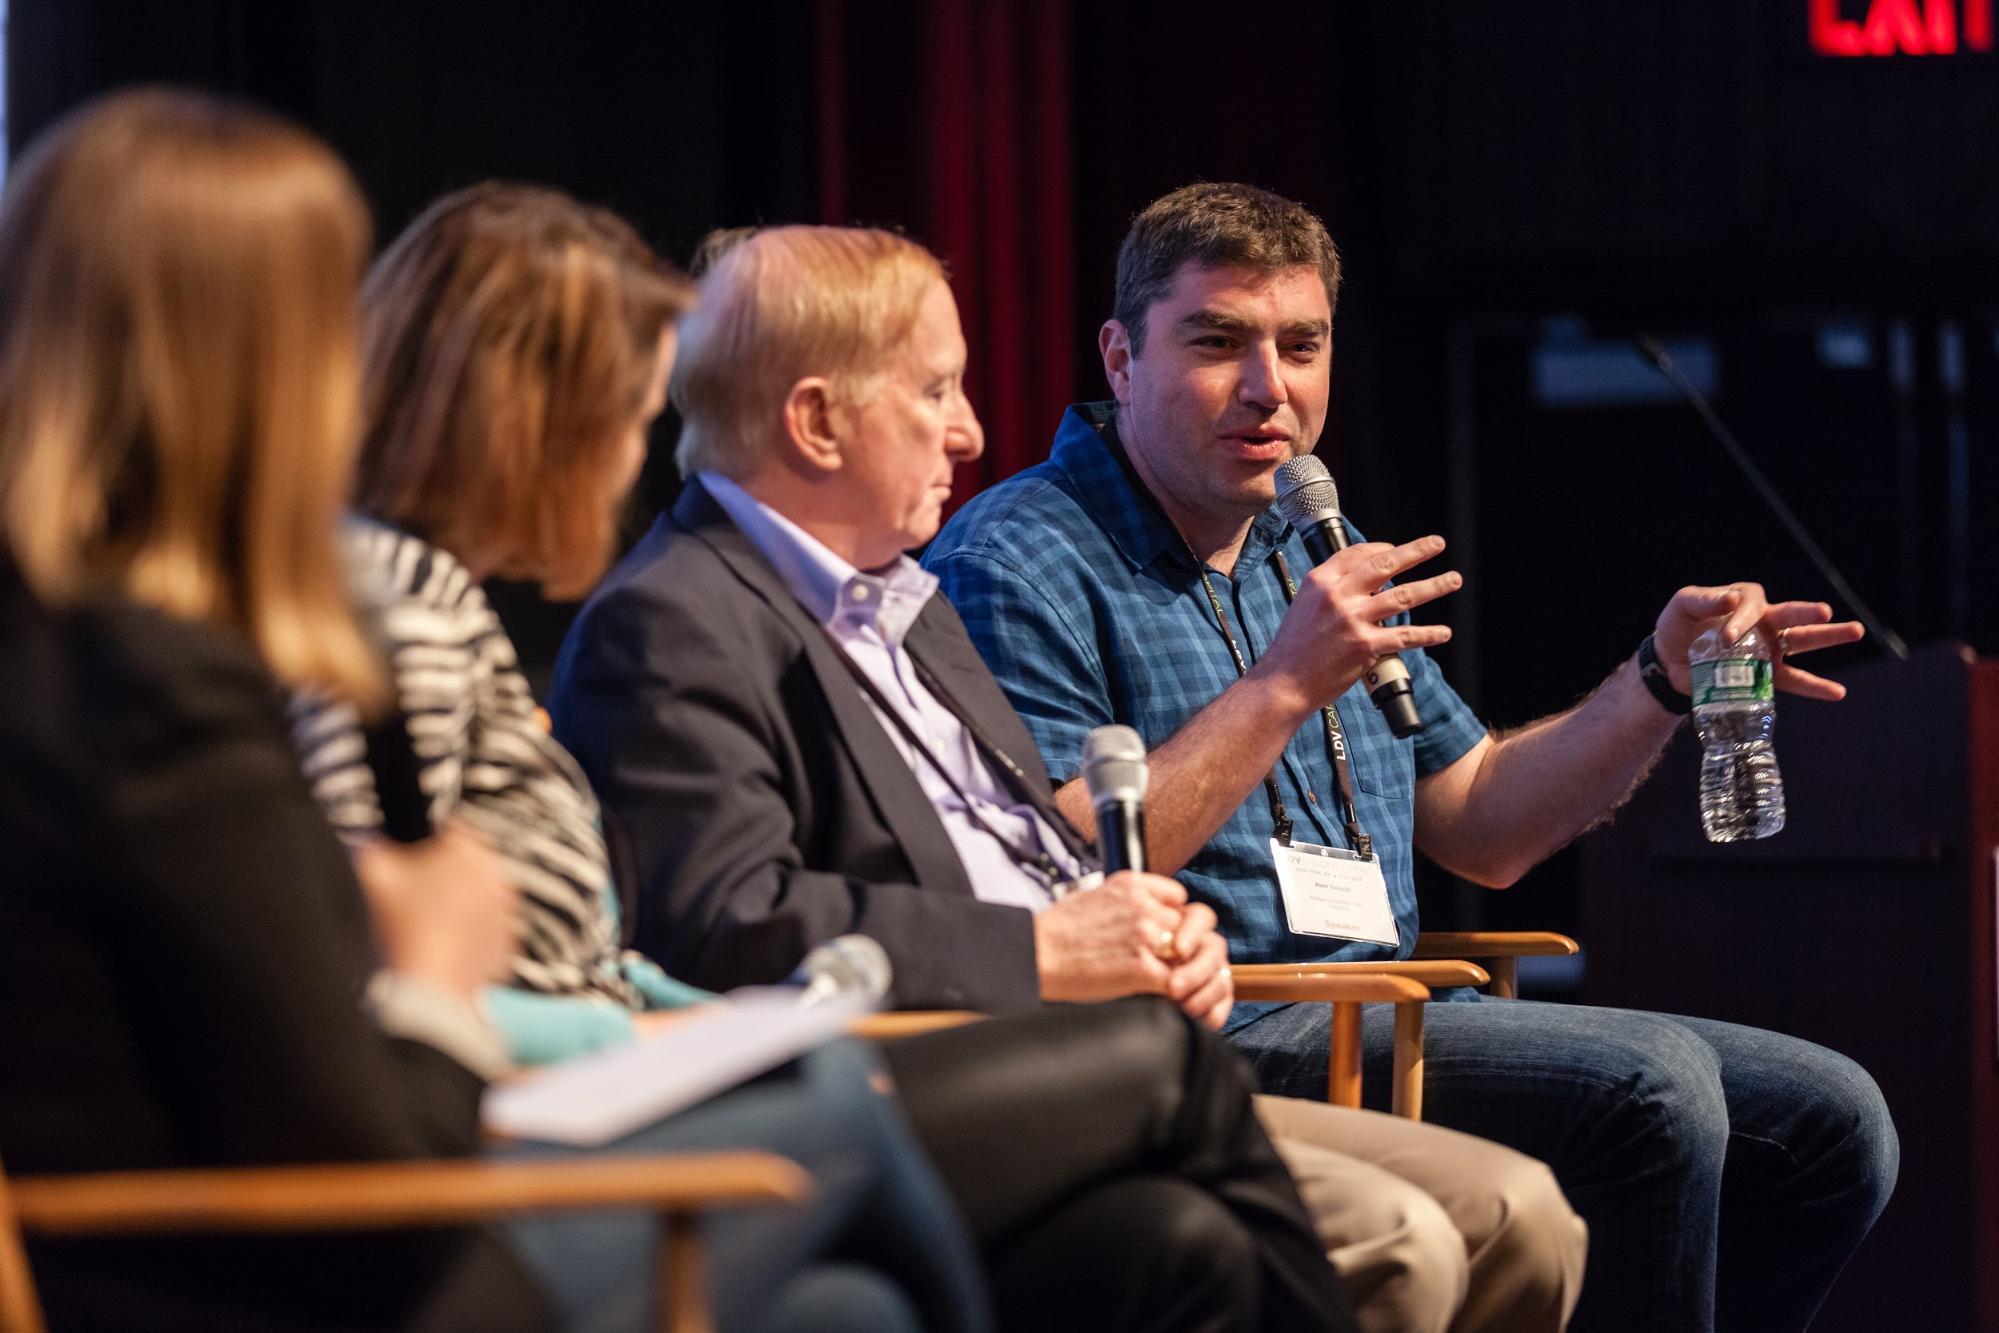 (Speaking) Alex Iskold, Managing Director of Techstars © Robert Wright/LDV Vision Summit